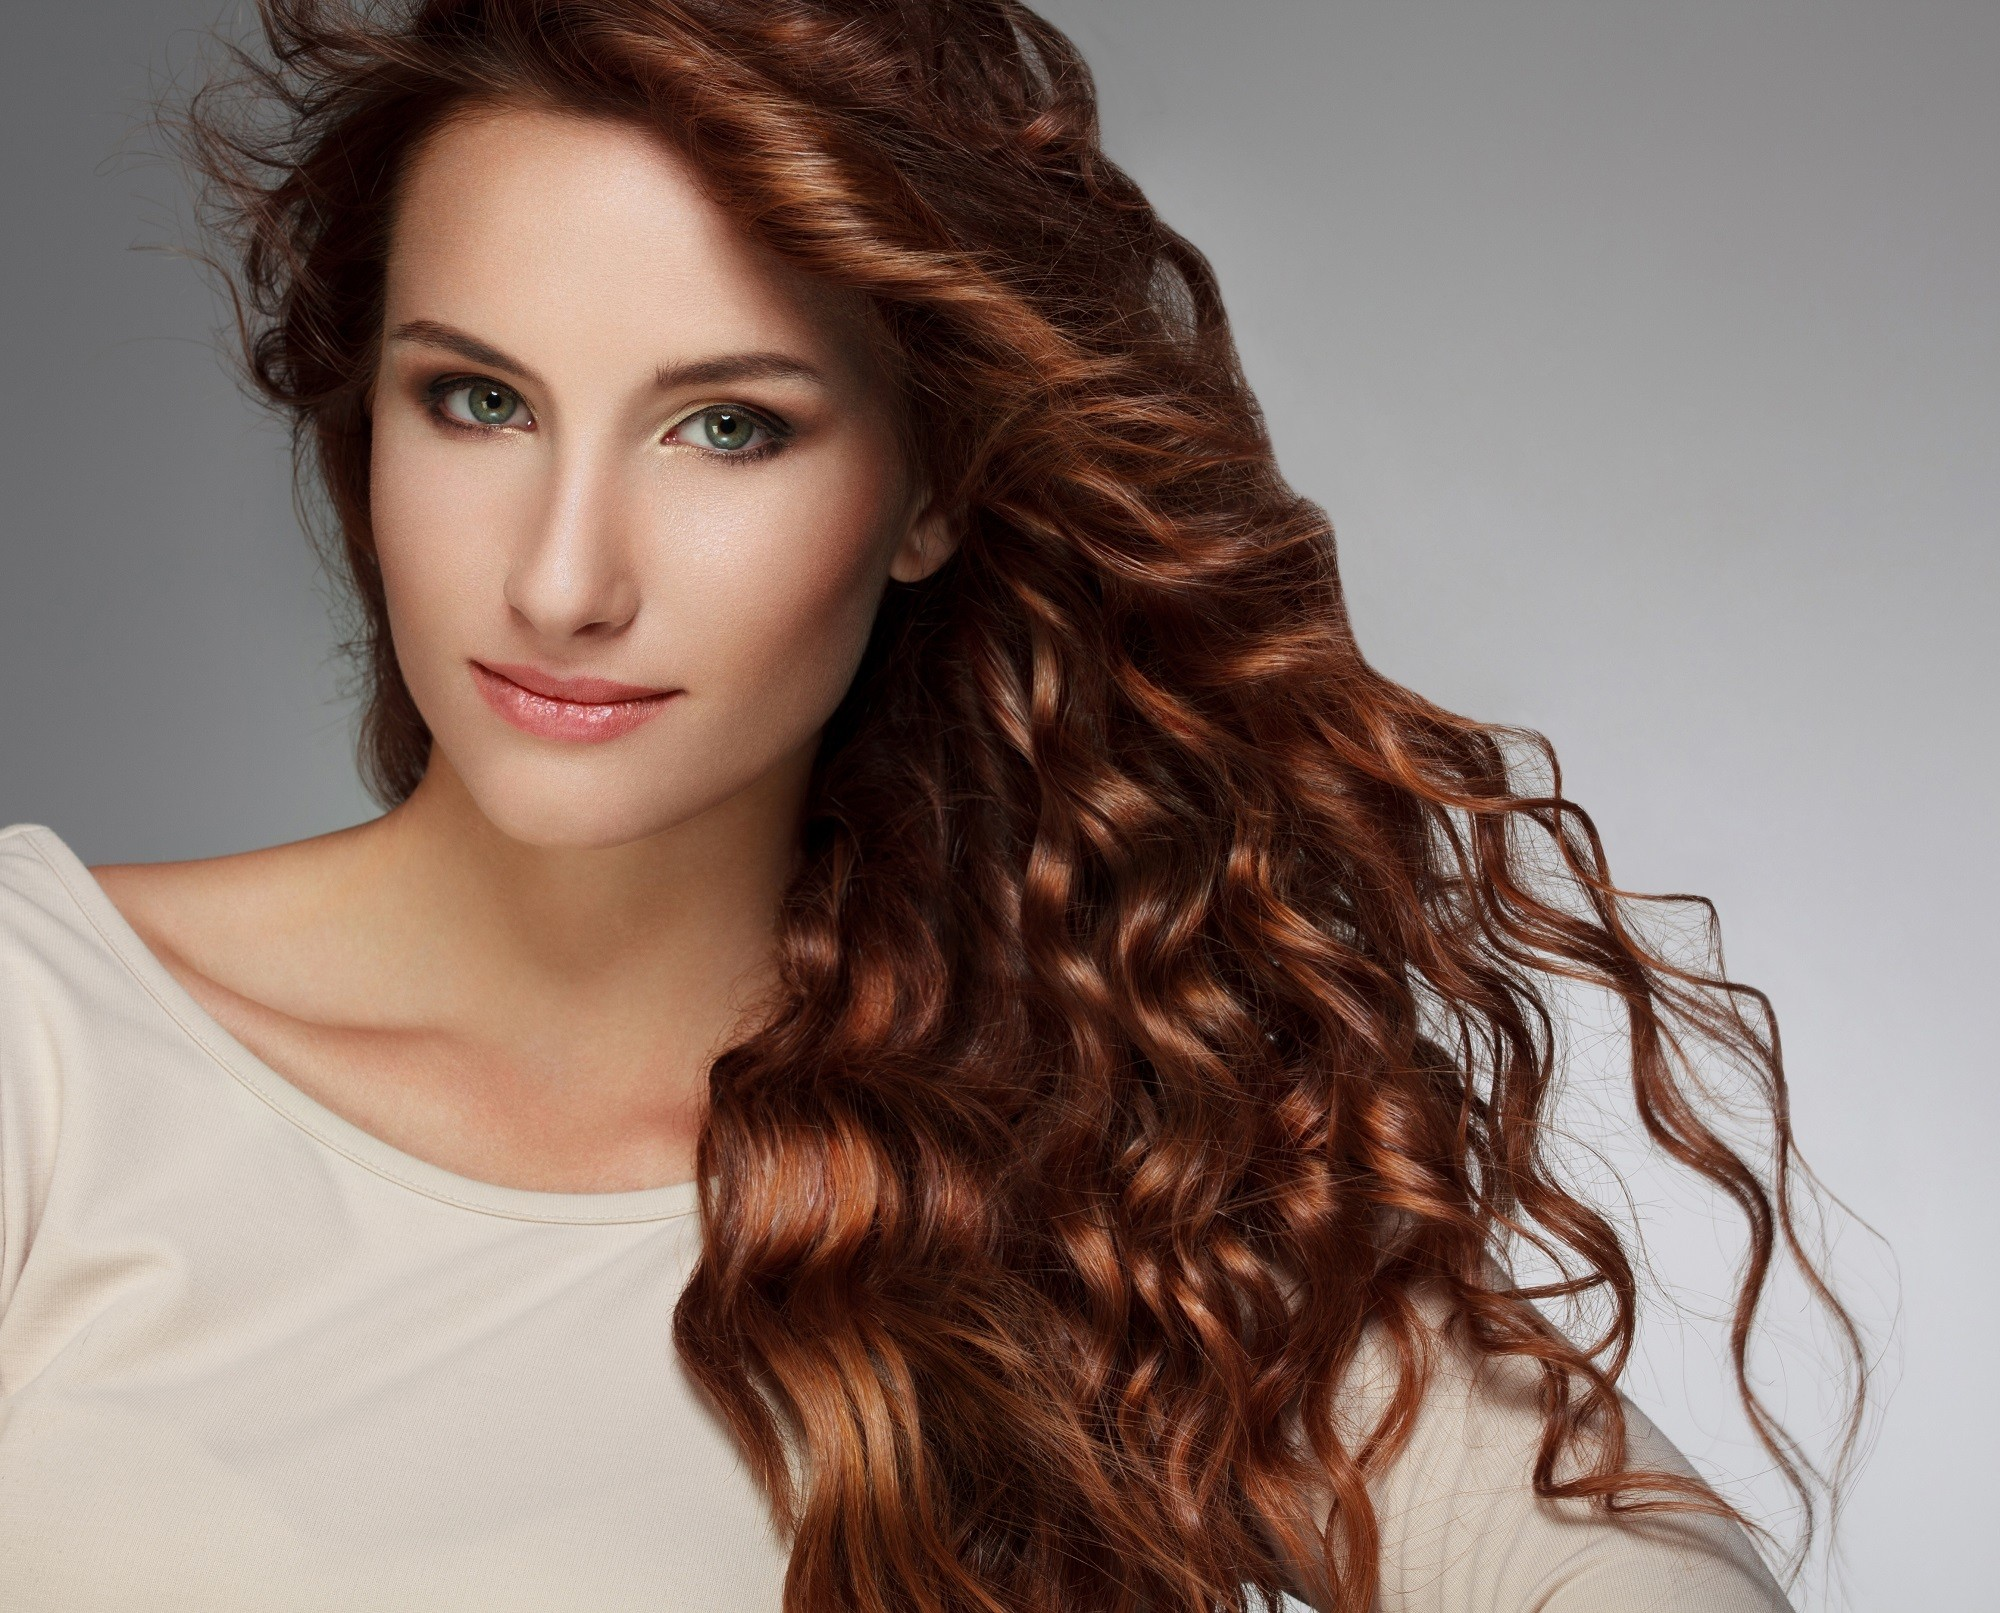 Mermaid hair ideas 2: Long, curly hair